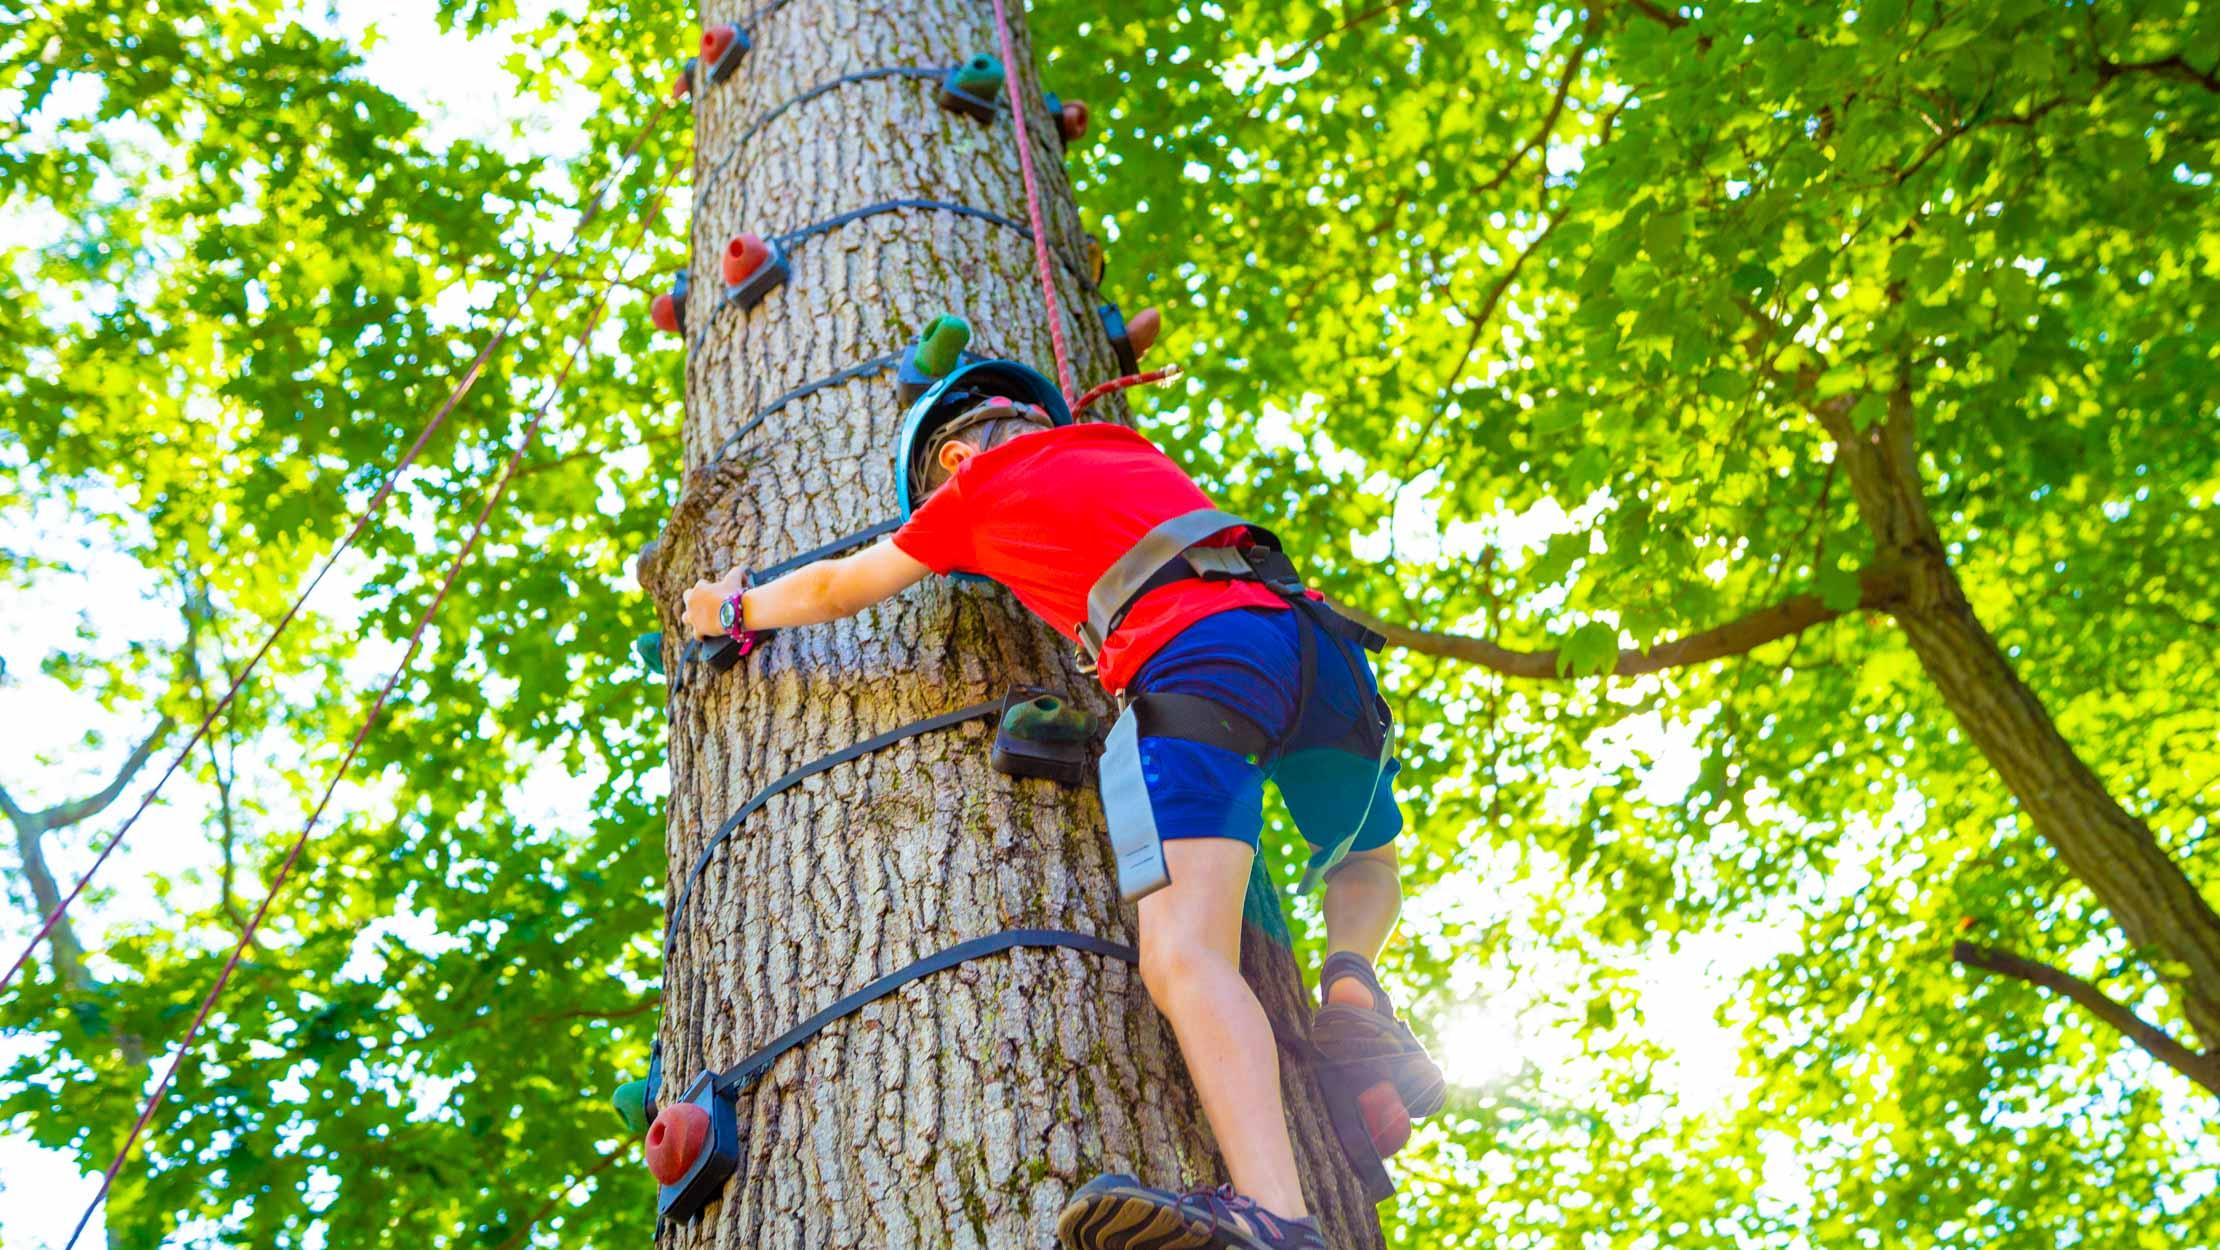 Camper climbing a tree